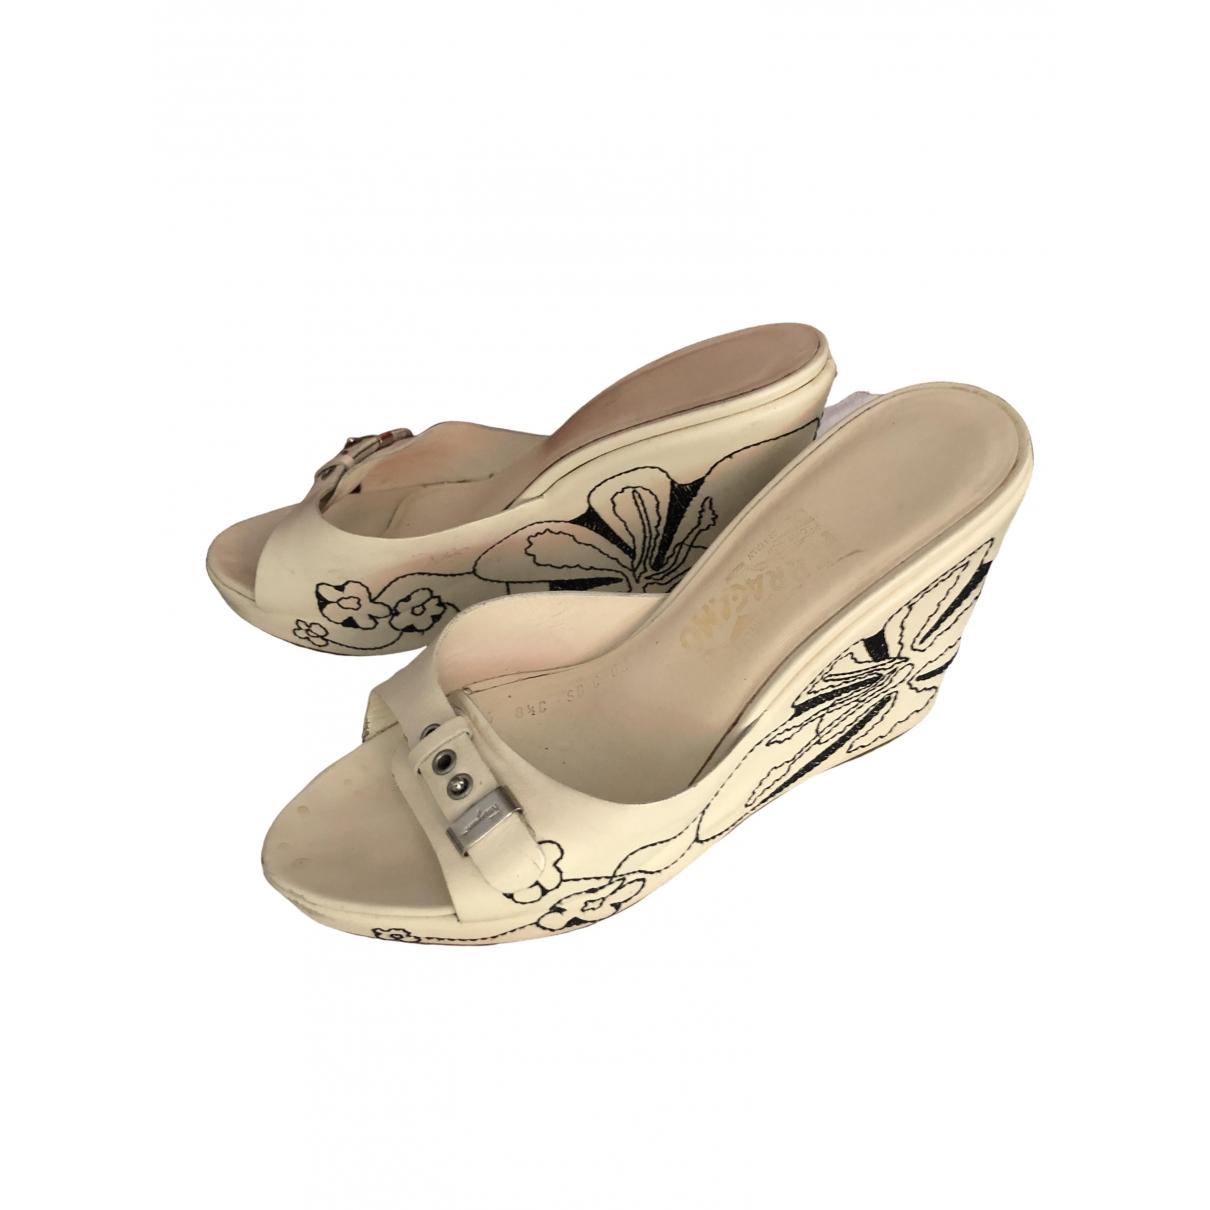 Salvatore Ferragamo \N Ecru Leather Sandals for Women 39 EU